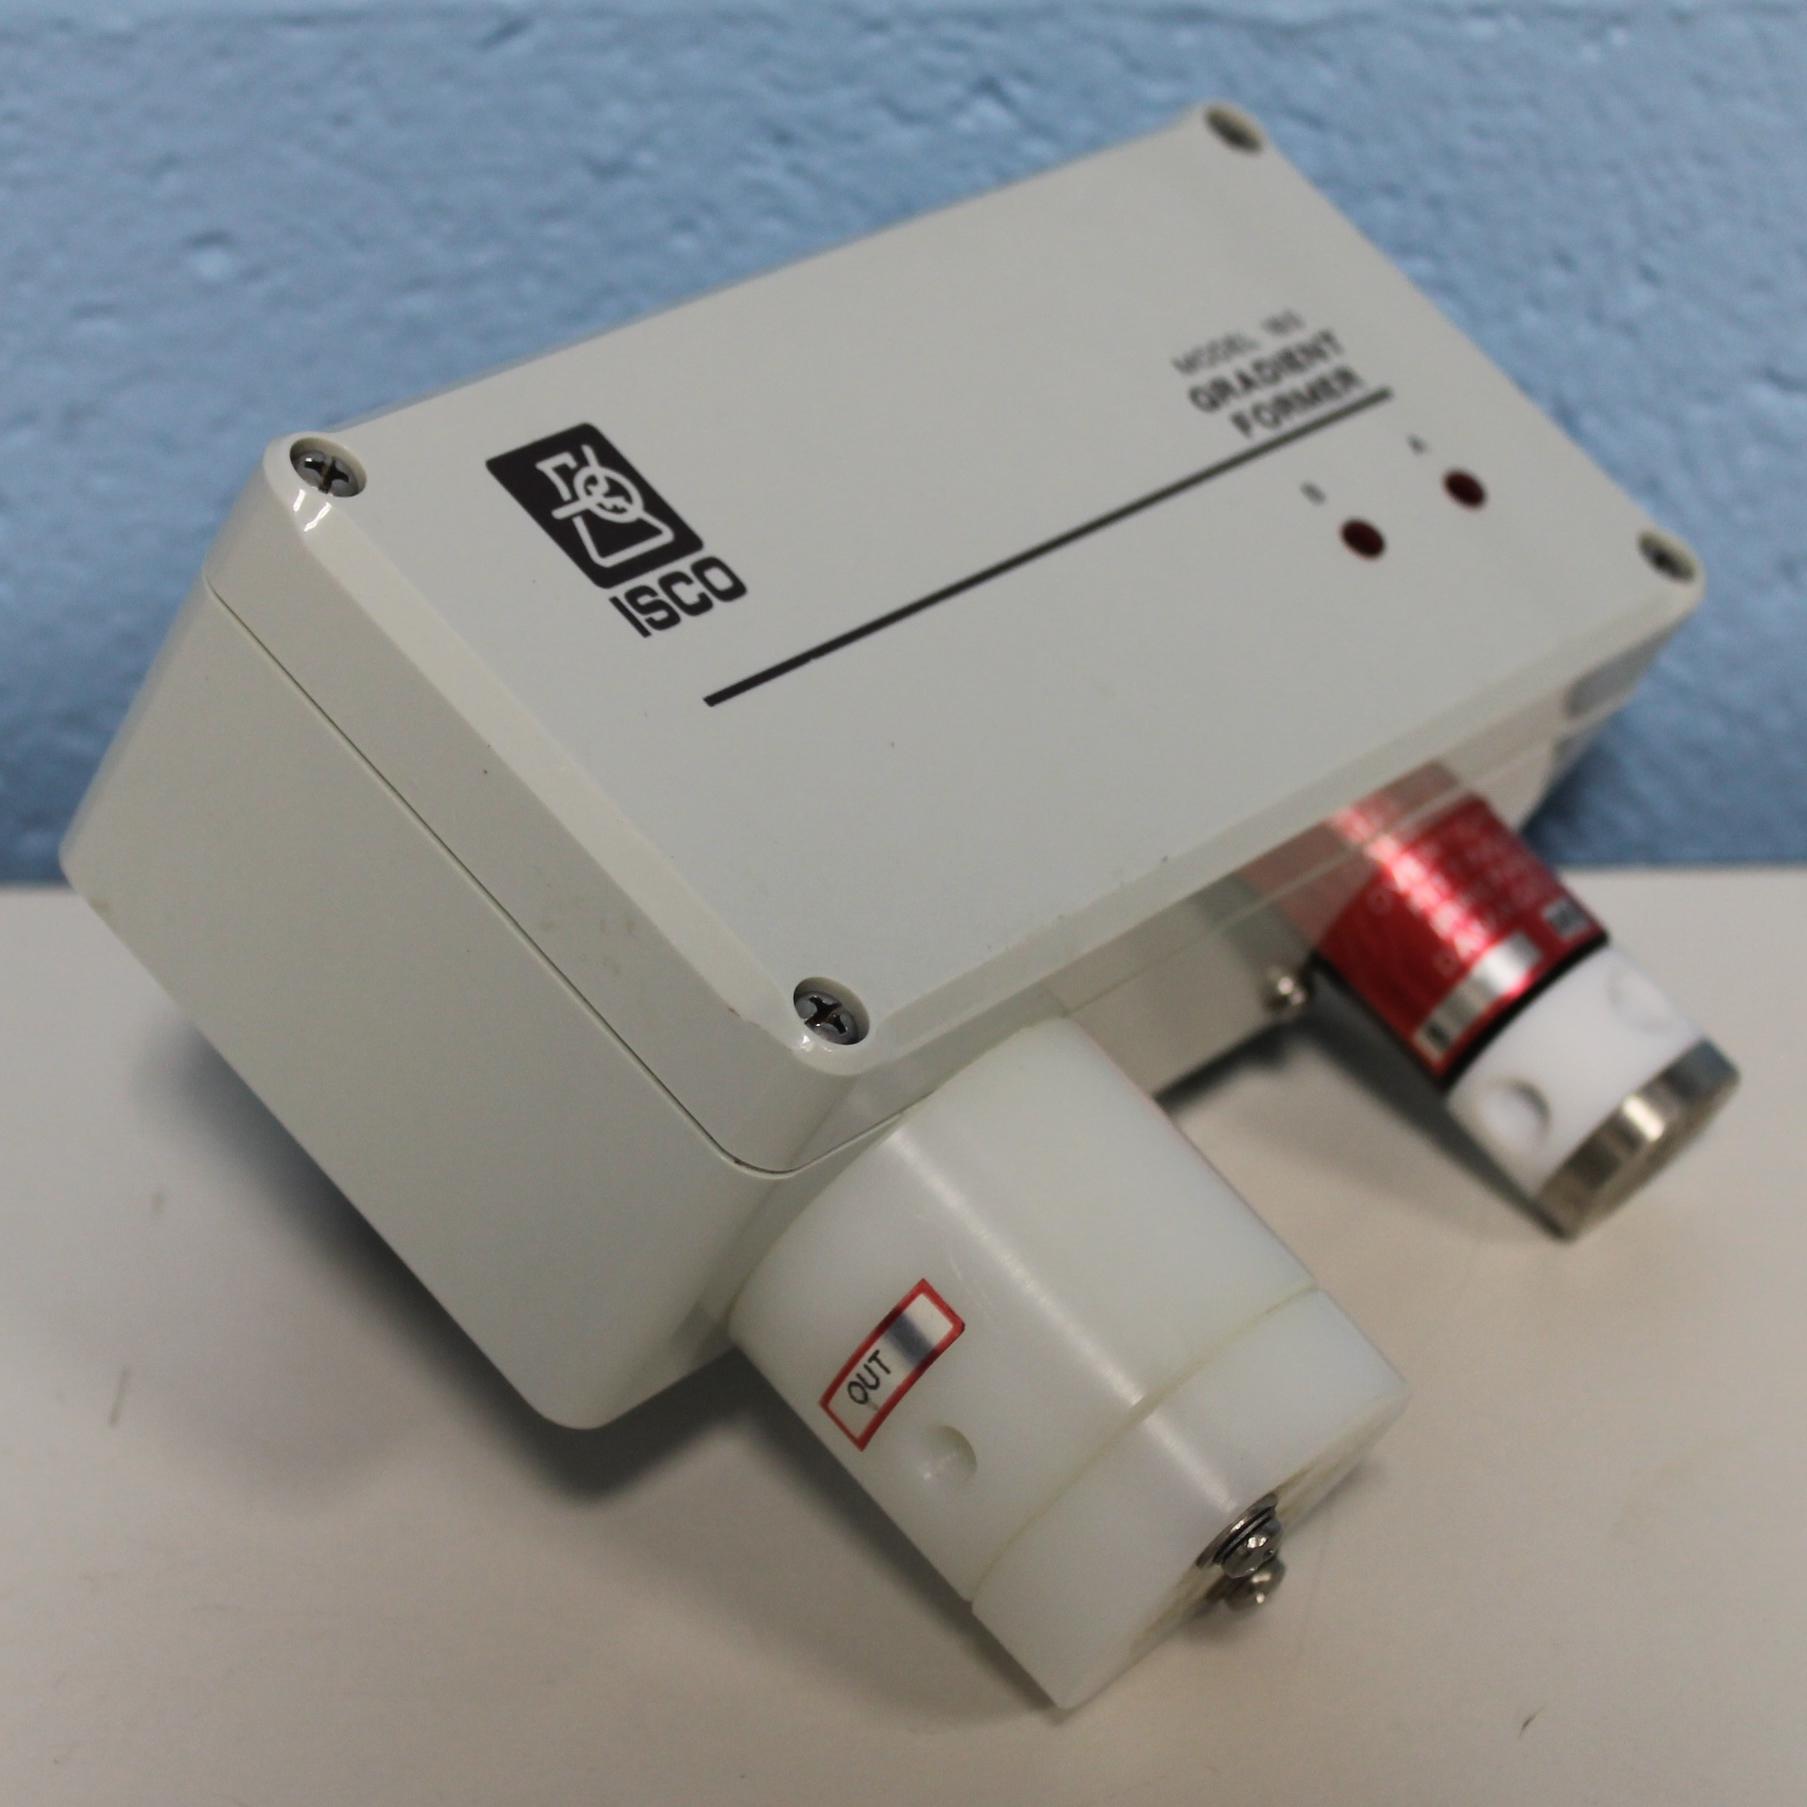 ISCO Gradient Former Model 160 Image